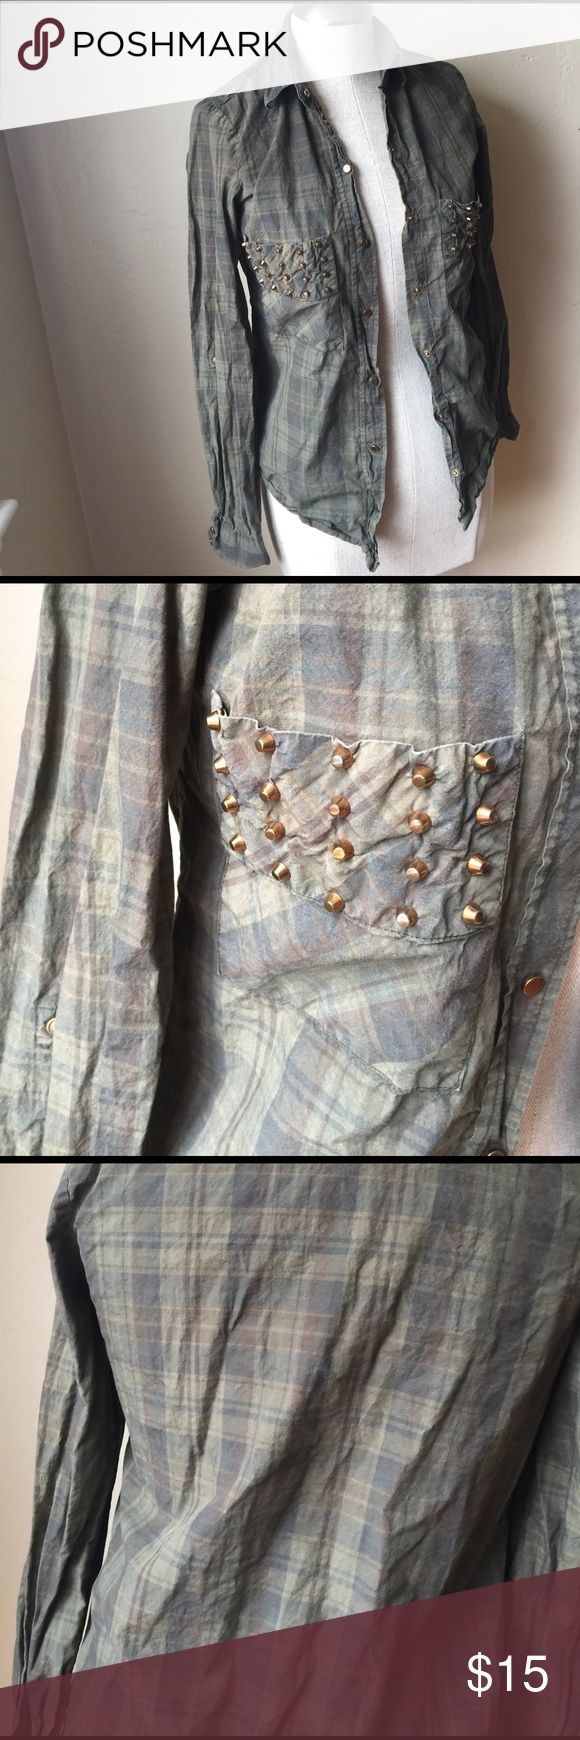 Leara Woman plaid studded shirt Leara woman plaid long sleeve button up studded shirt. Size xs leara Woman Tops Button Down Shirts